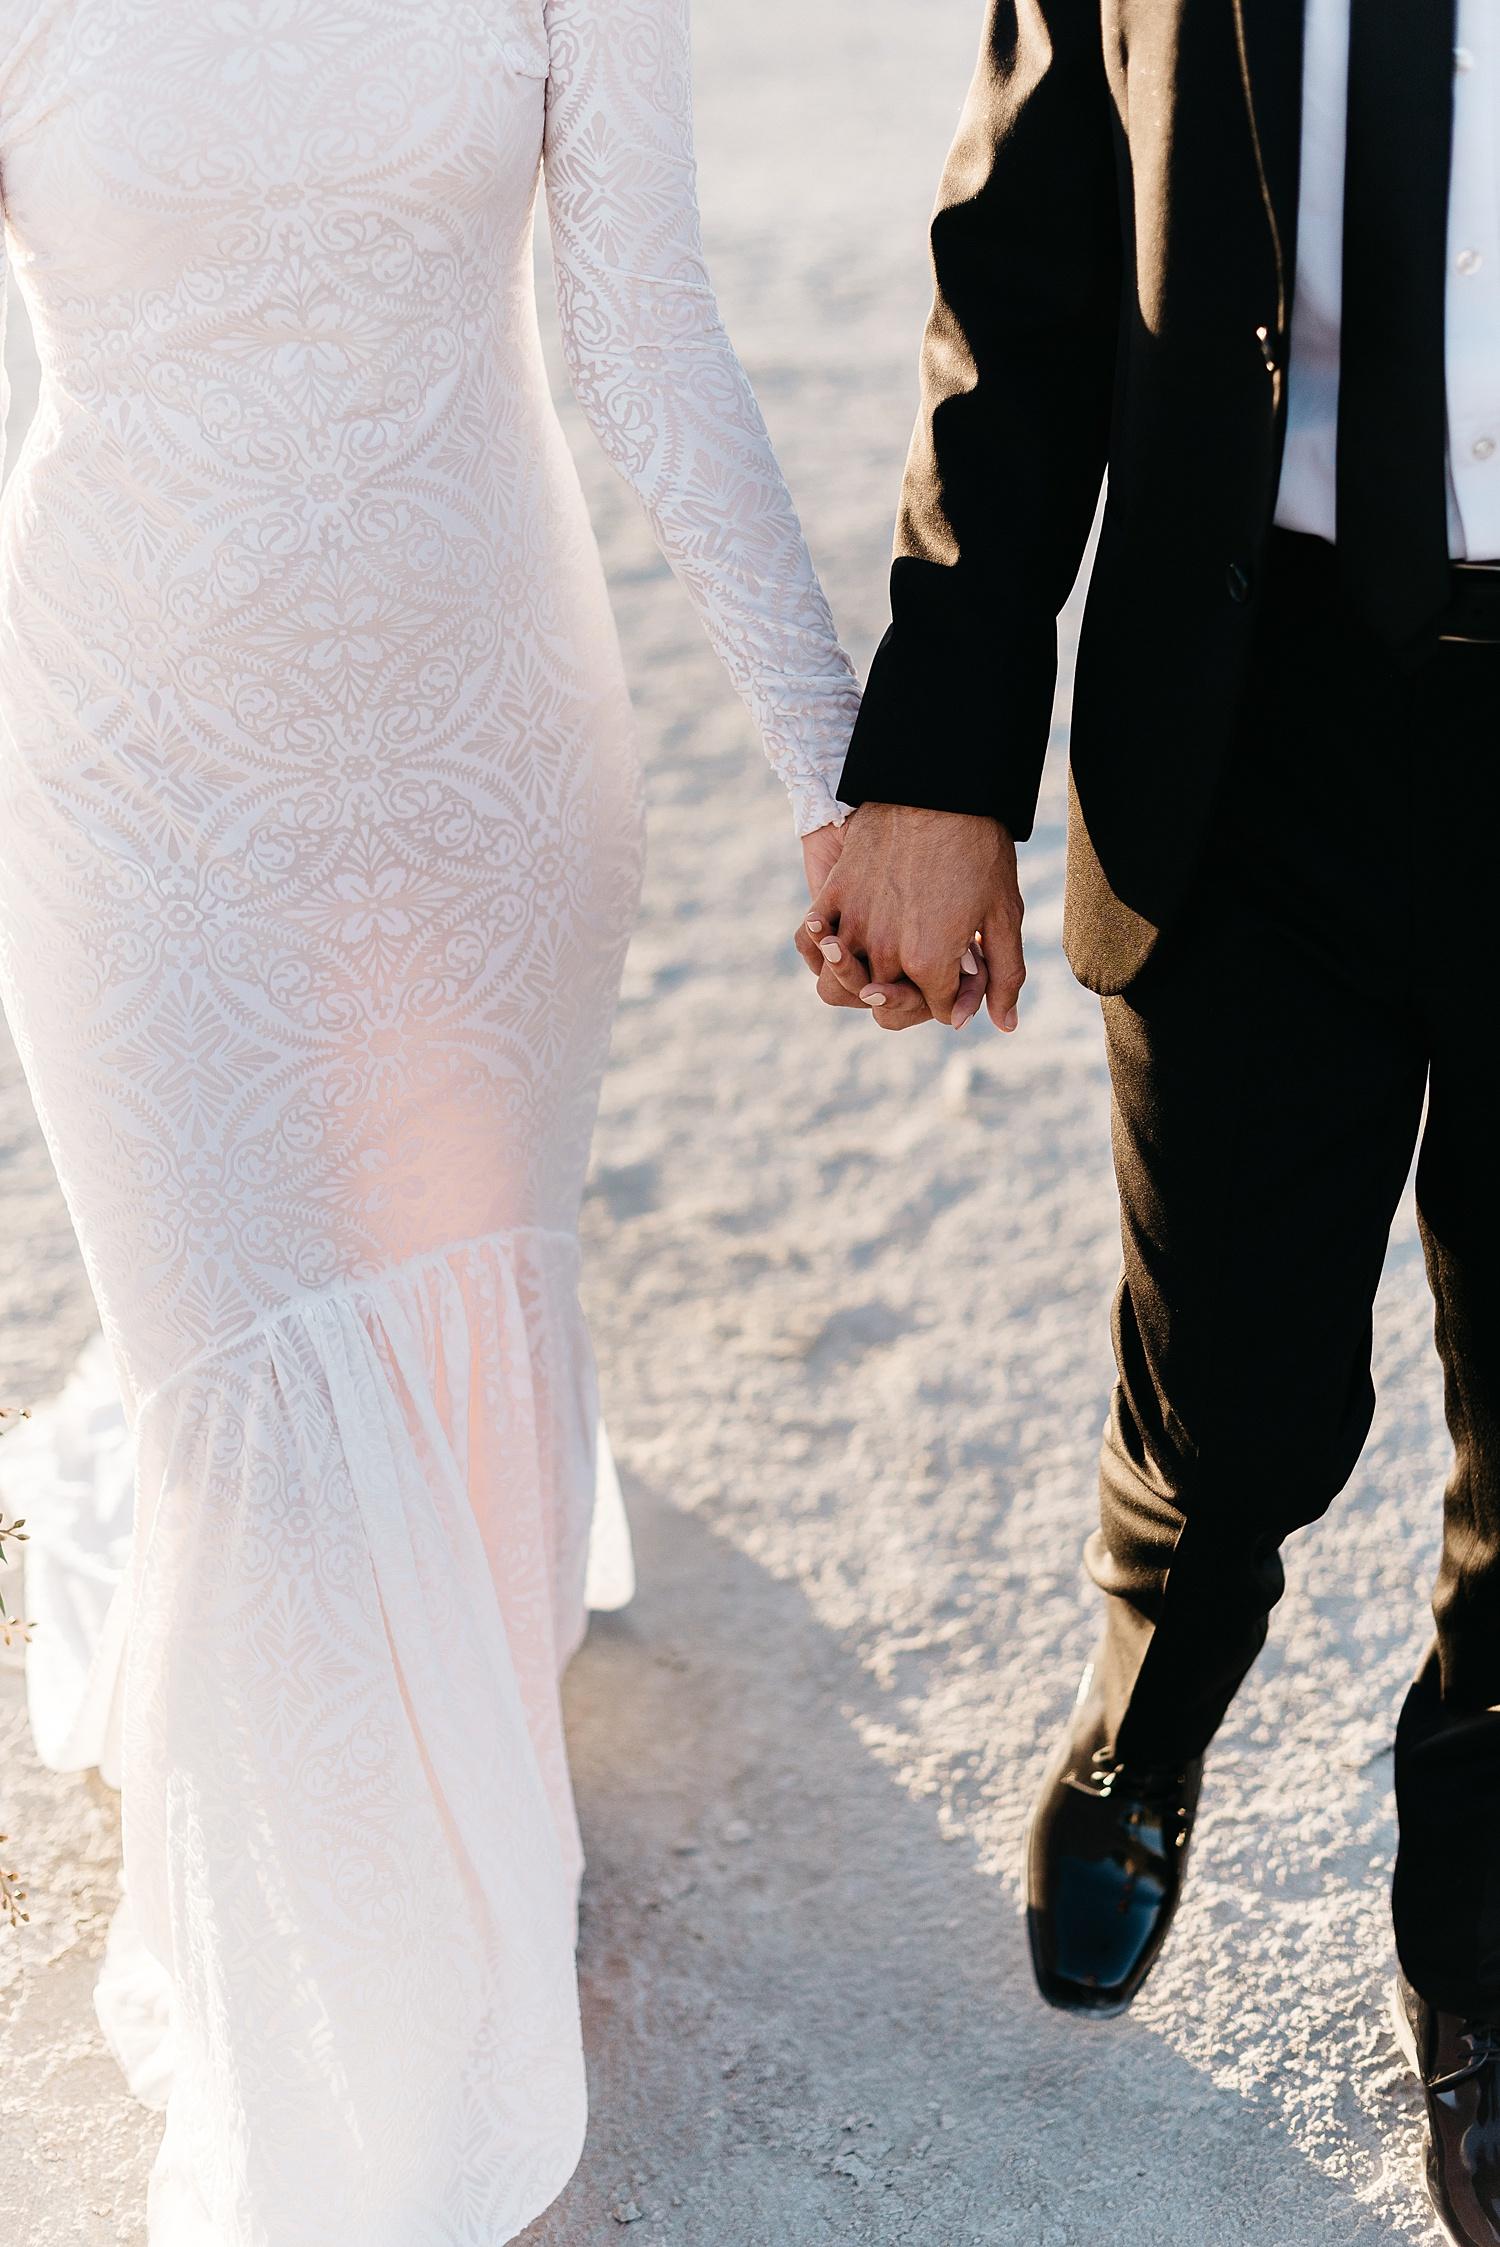 Zandra Barriga Photo - Cassie and Tristan Great Salt Lake Bridas_0008.jpg